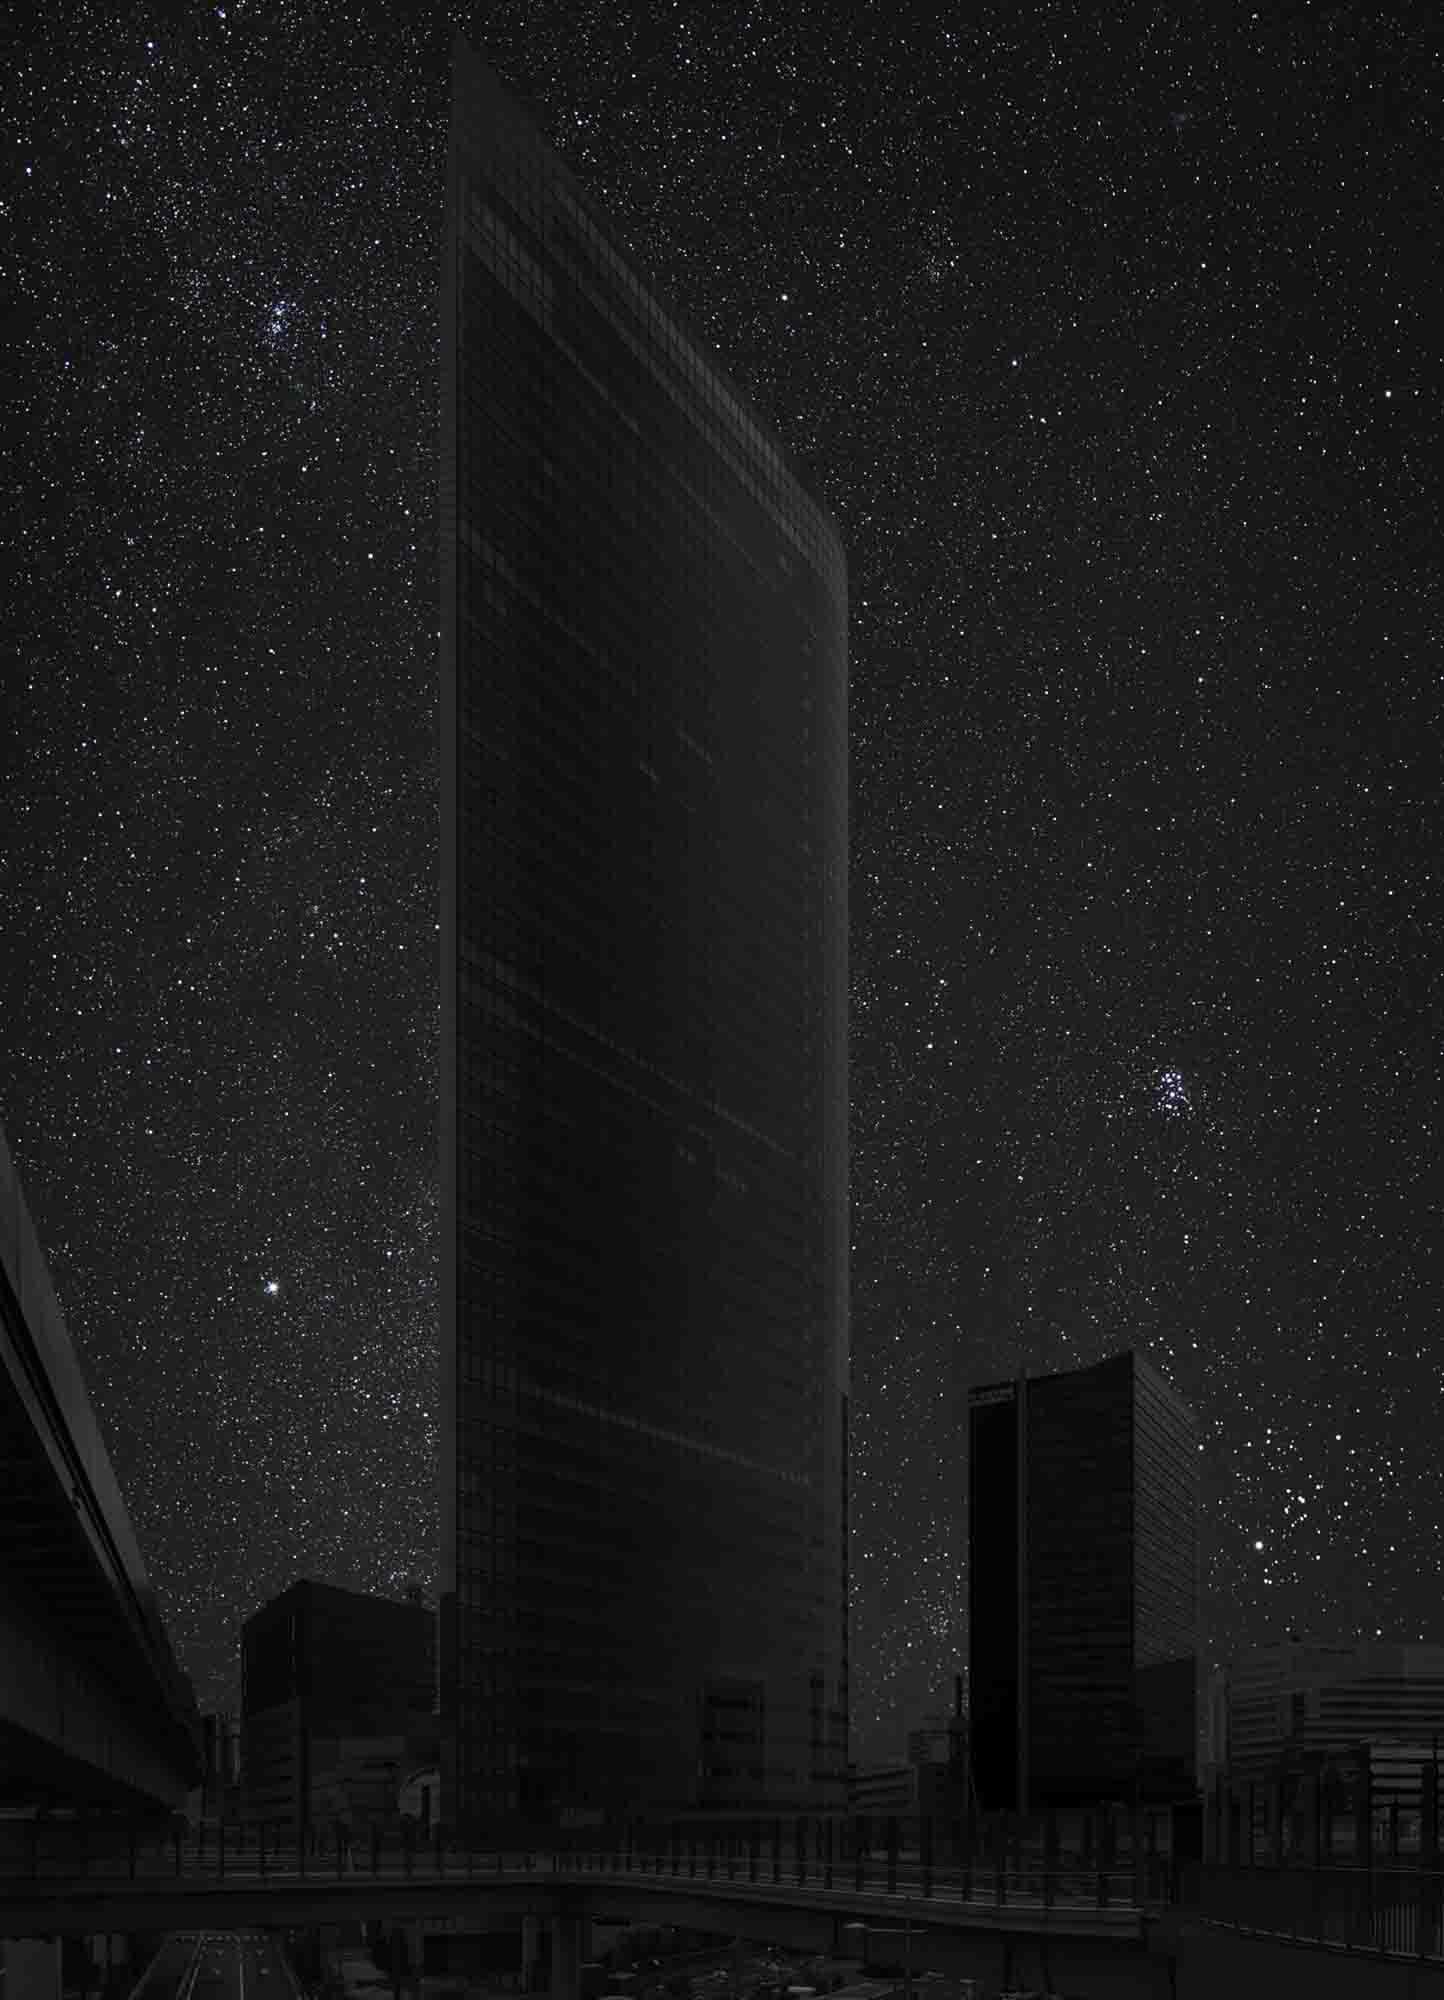 Tokyo 35° 39' 47'' N 2011-11-15 lst 22:50<br/>Darkened Cities - Villes éteintes